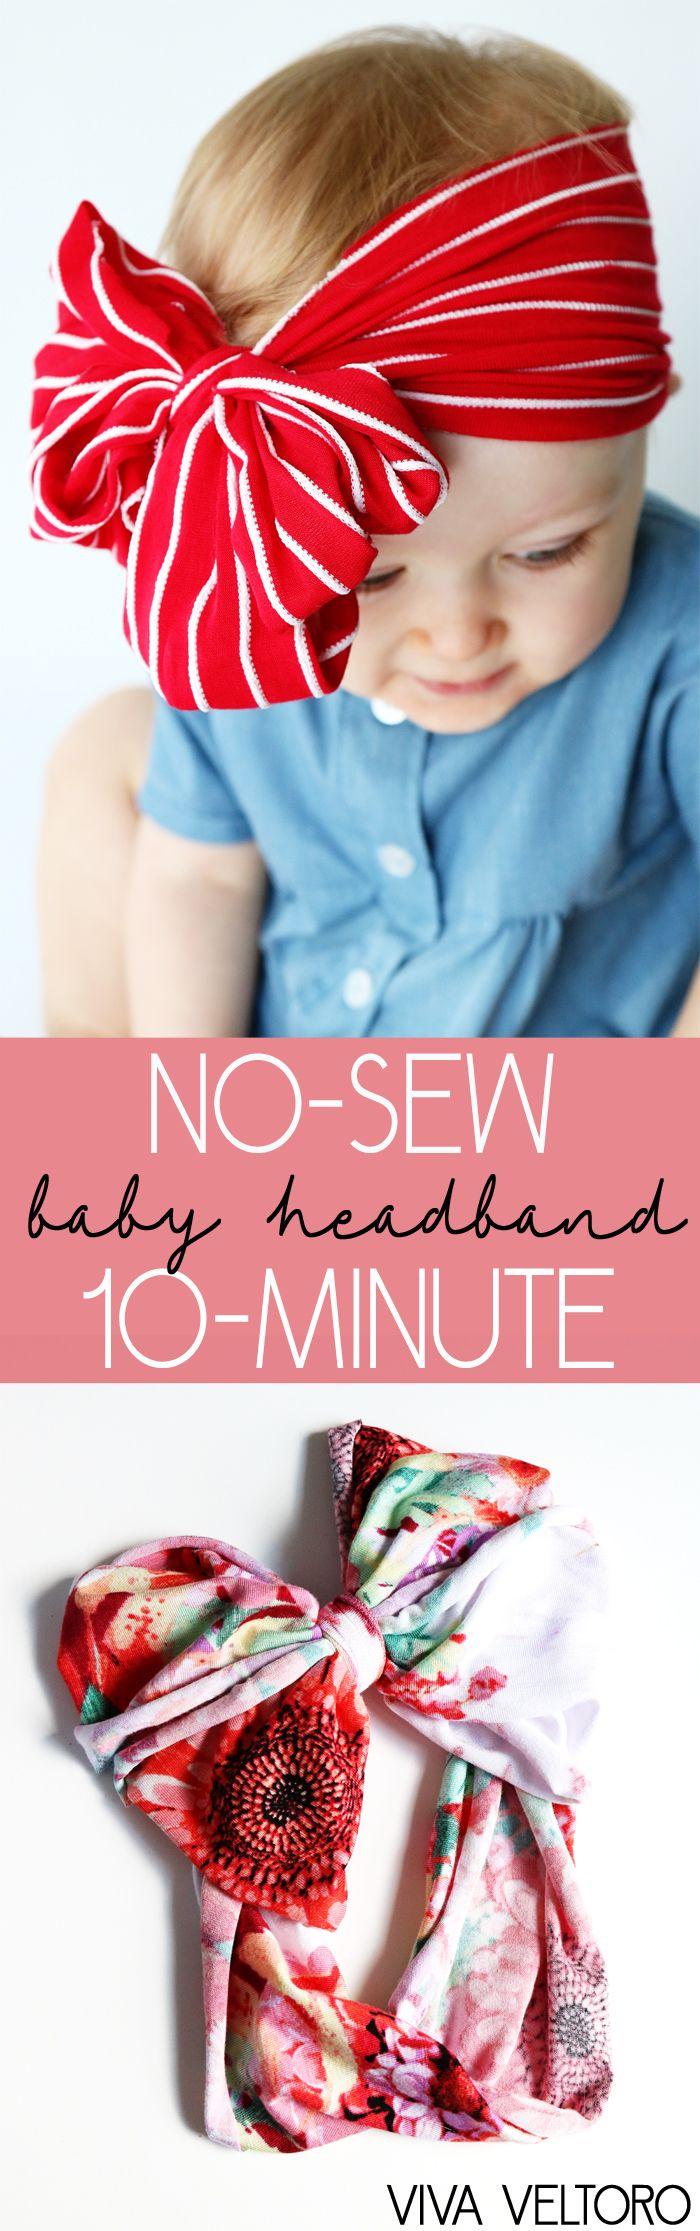 No Sewing Necessary This Diy Baby Headband Tutorial Will